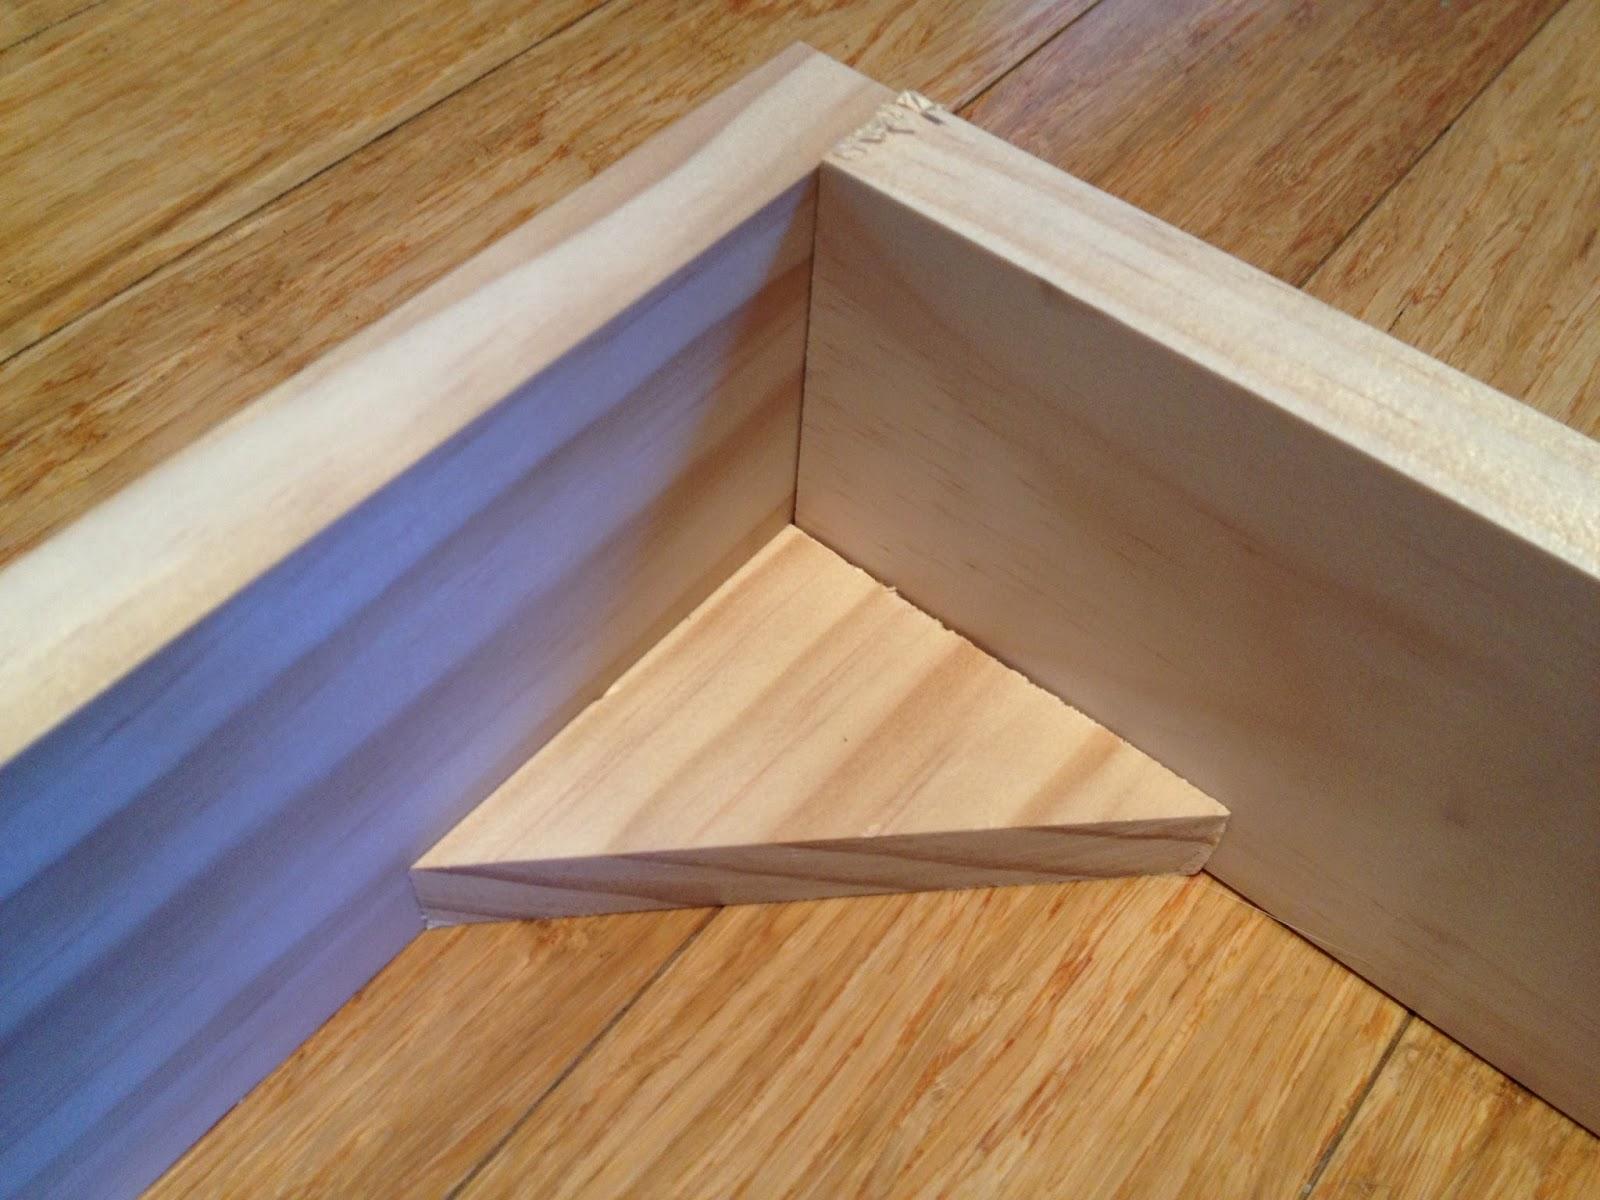 Grizzlyaudio Diy Acoustic Panels